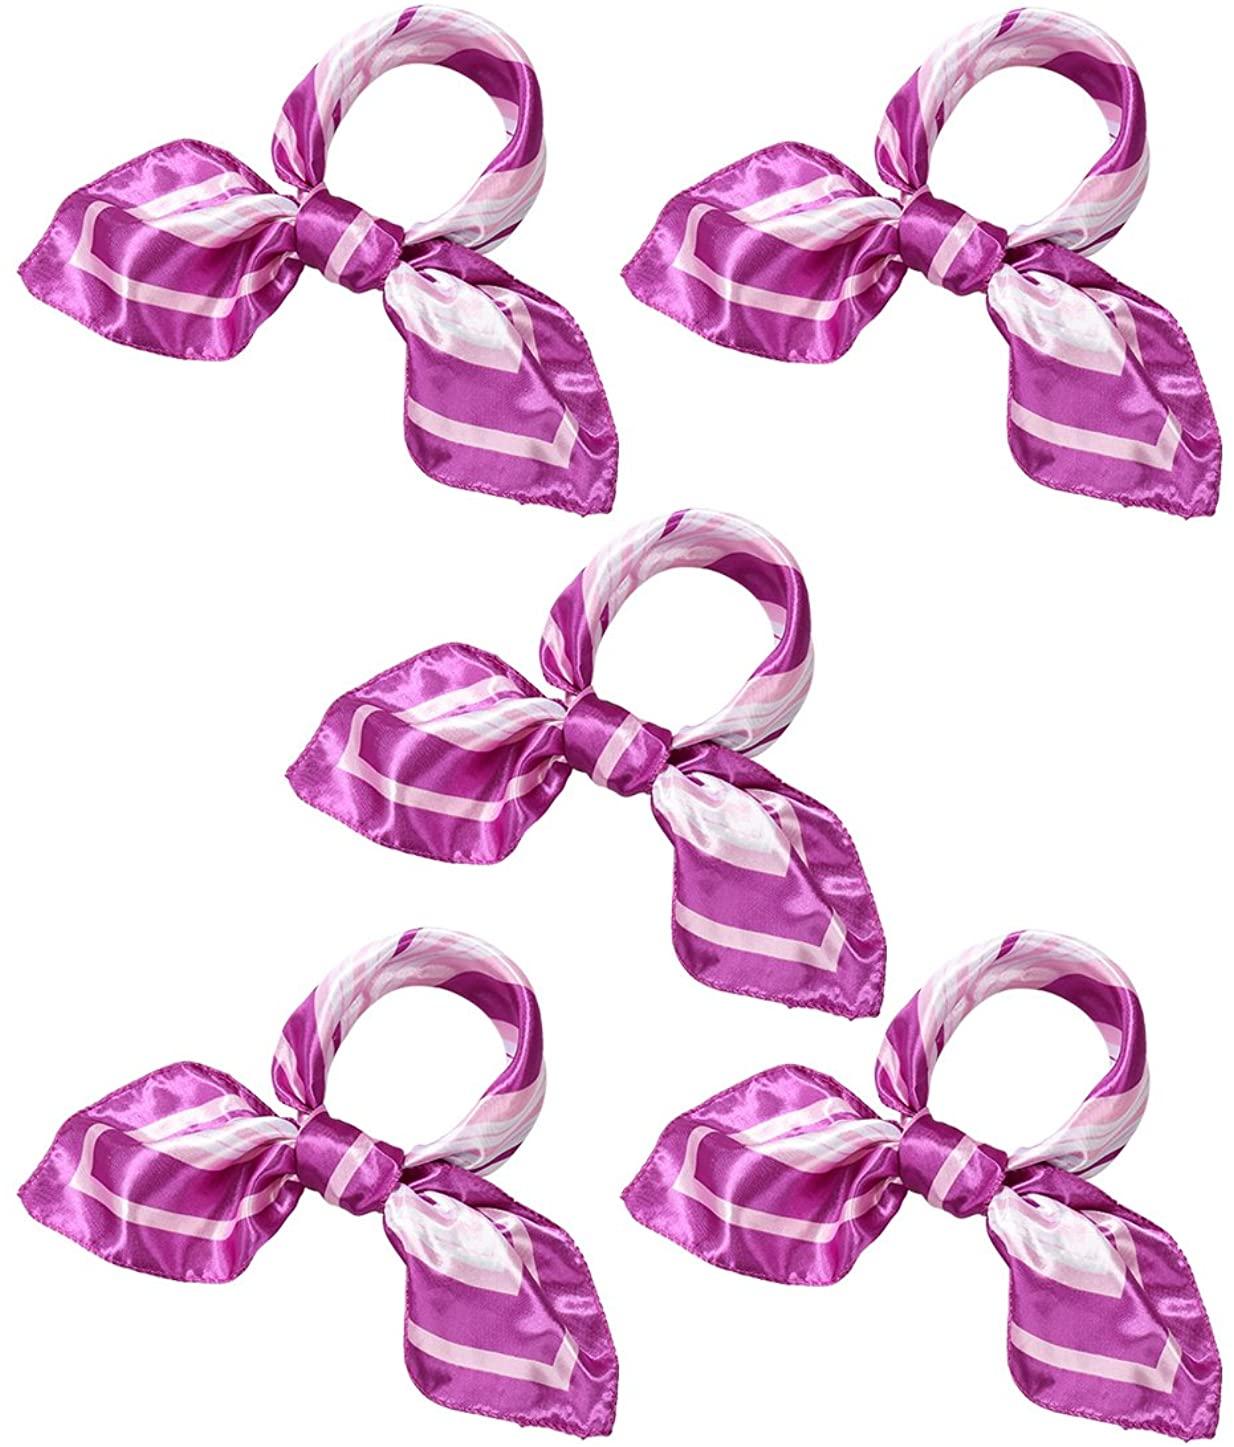 uxcell K28 Ladies Infinity Square Shape Prints Wrap Kerchief Purple Pink